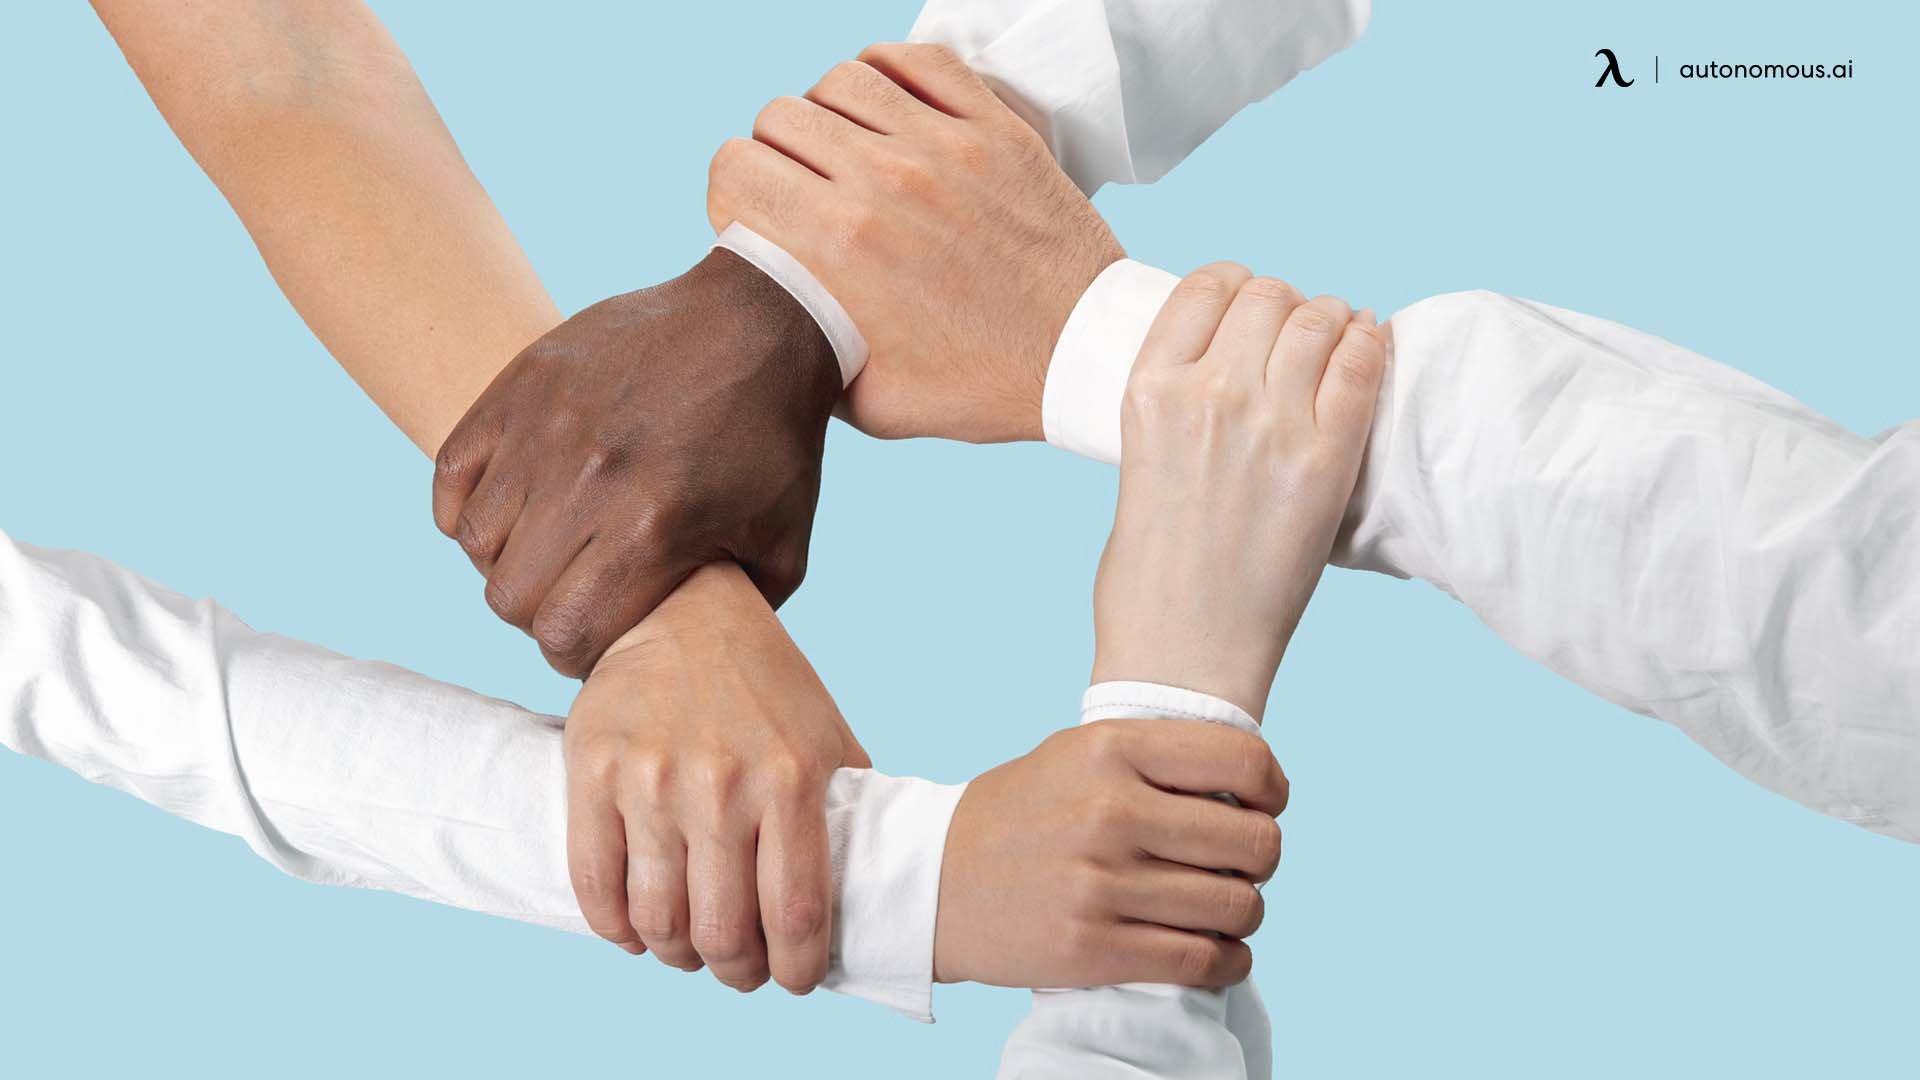 Establish a Bond of Trust